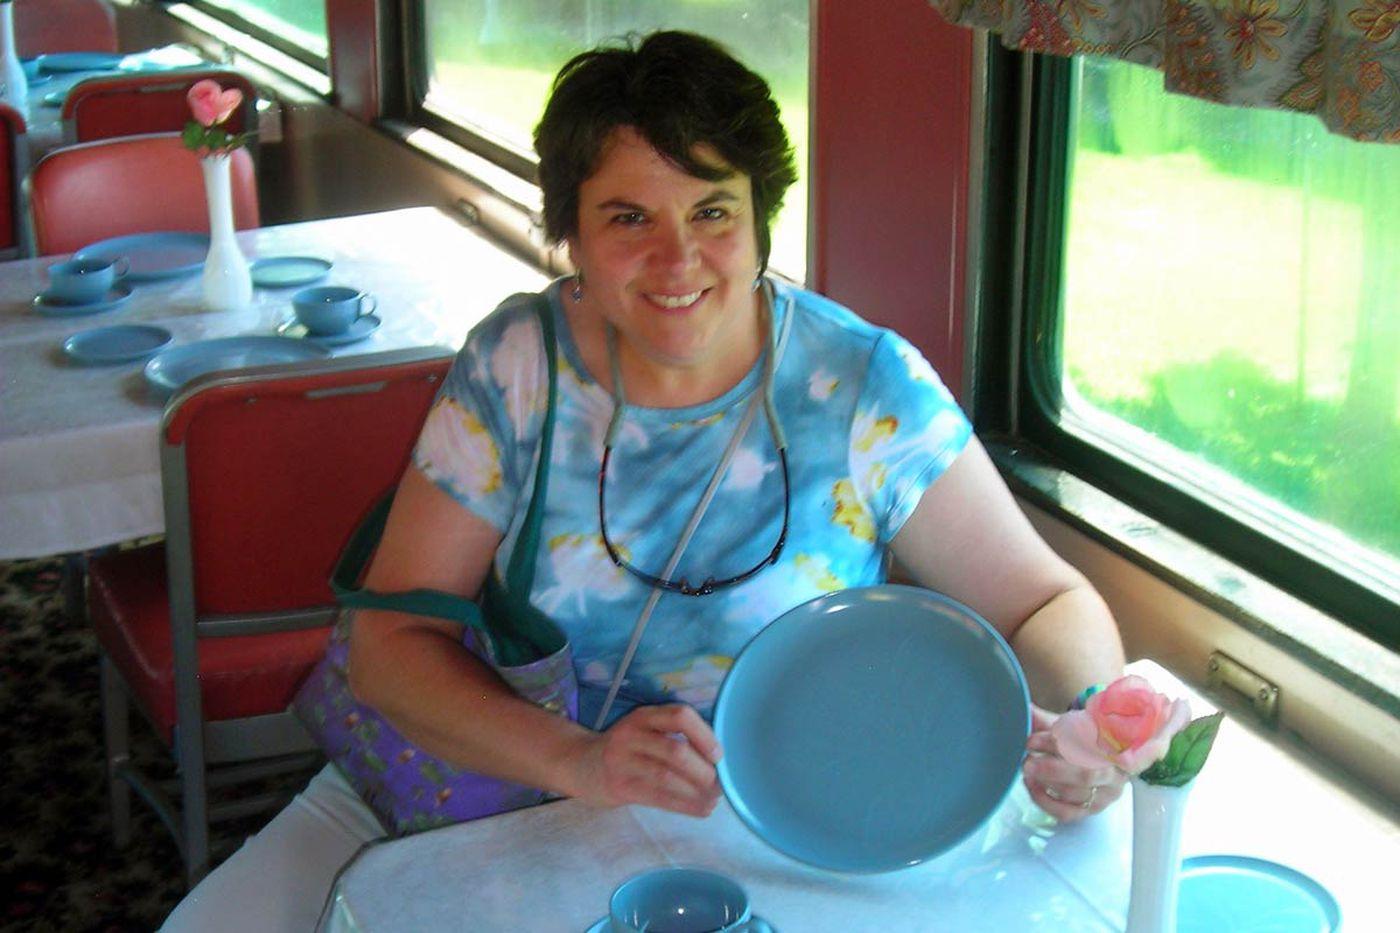 Susan Kraft, 55, park ranger and museum curator